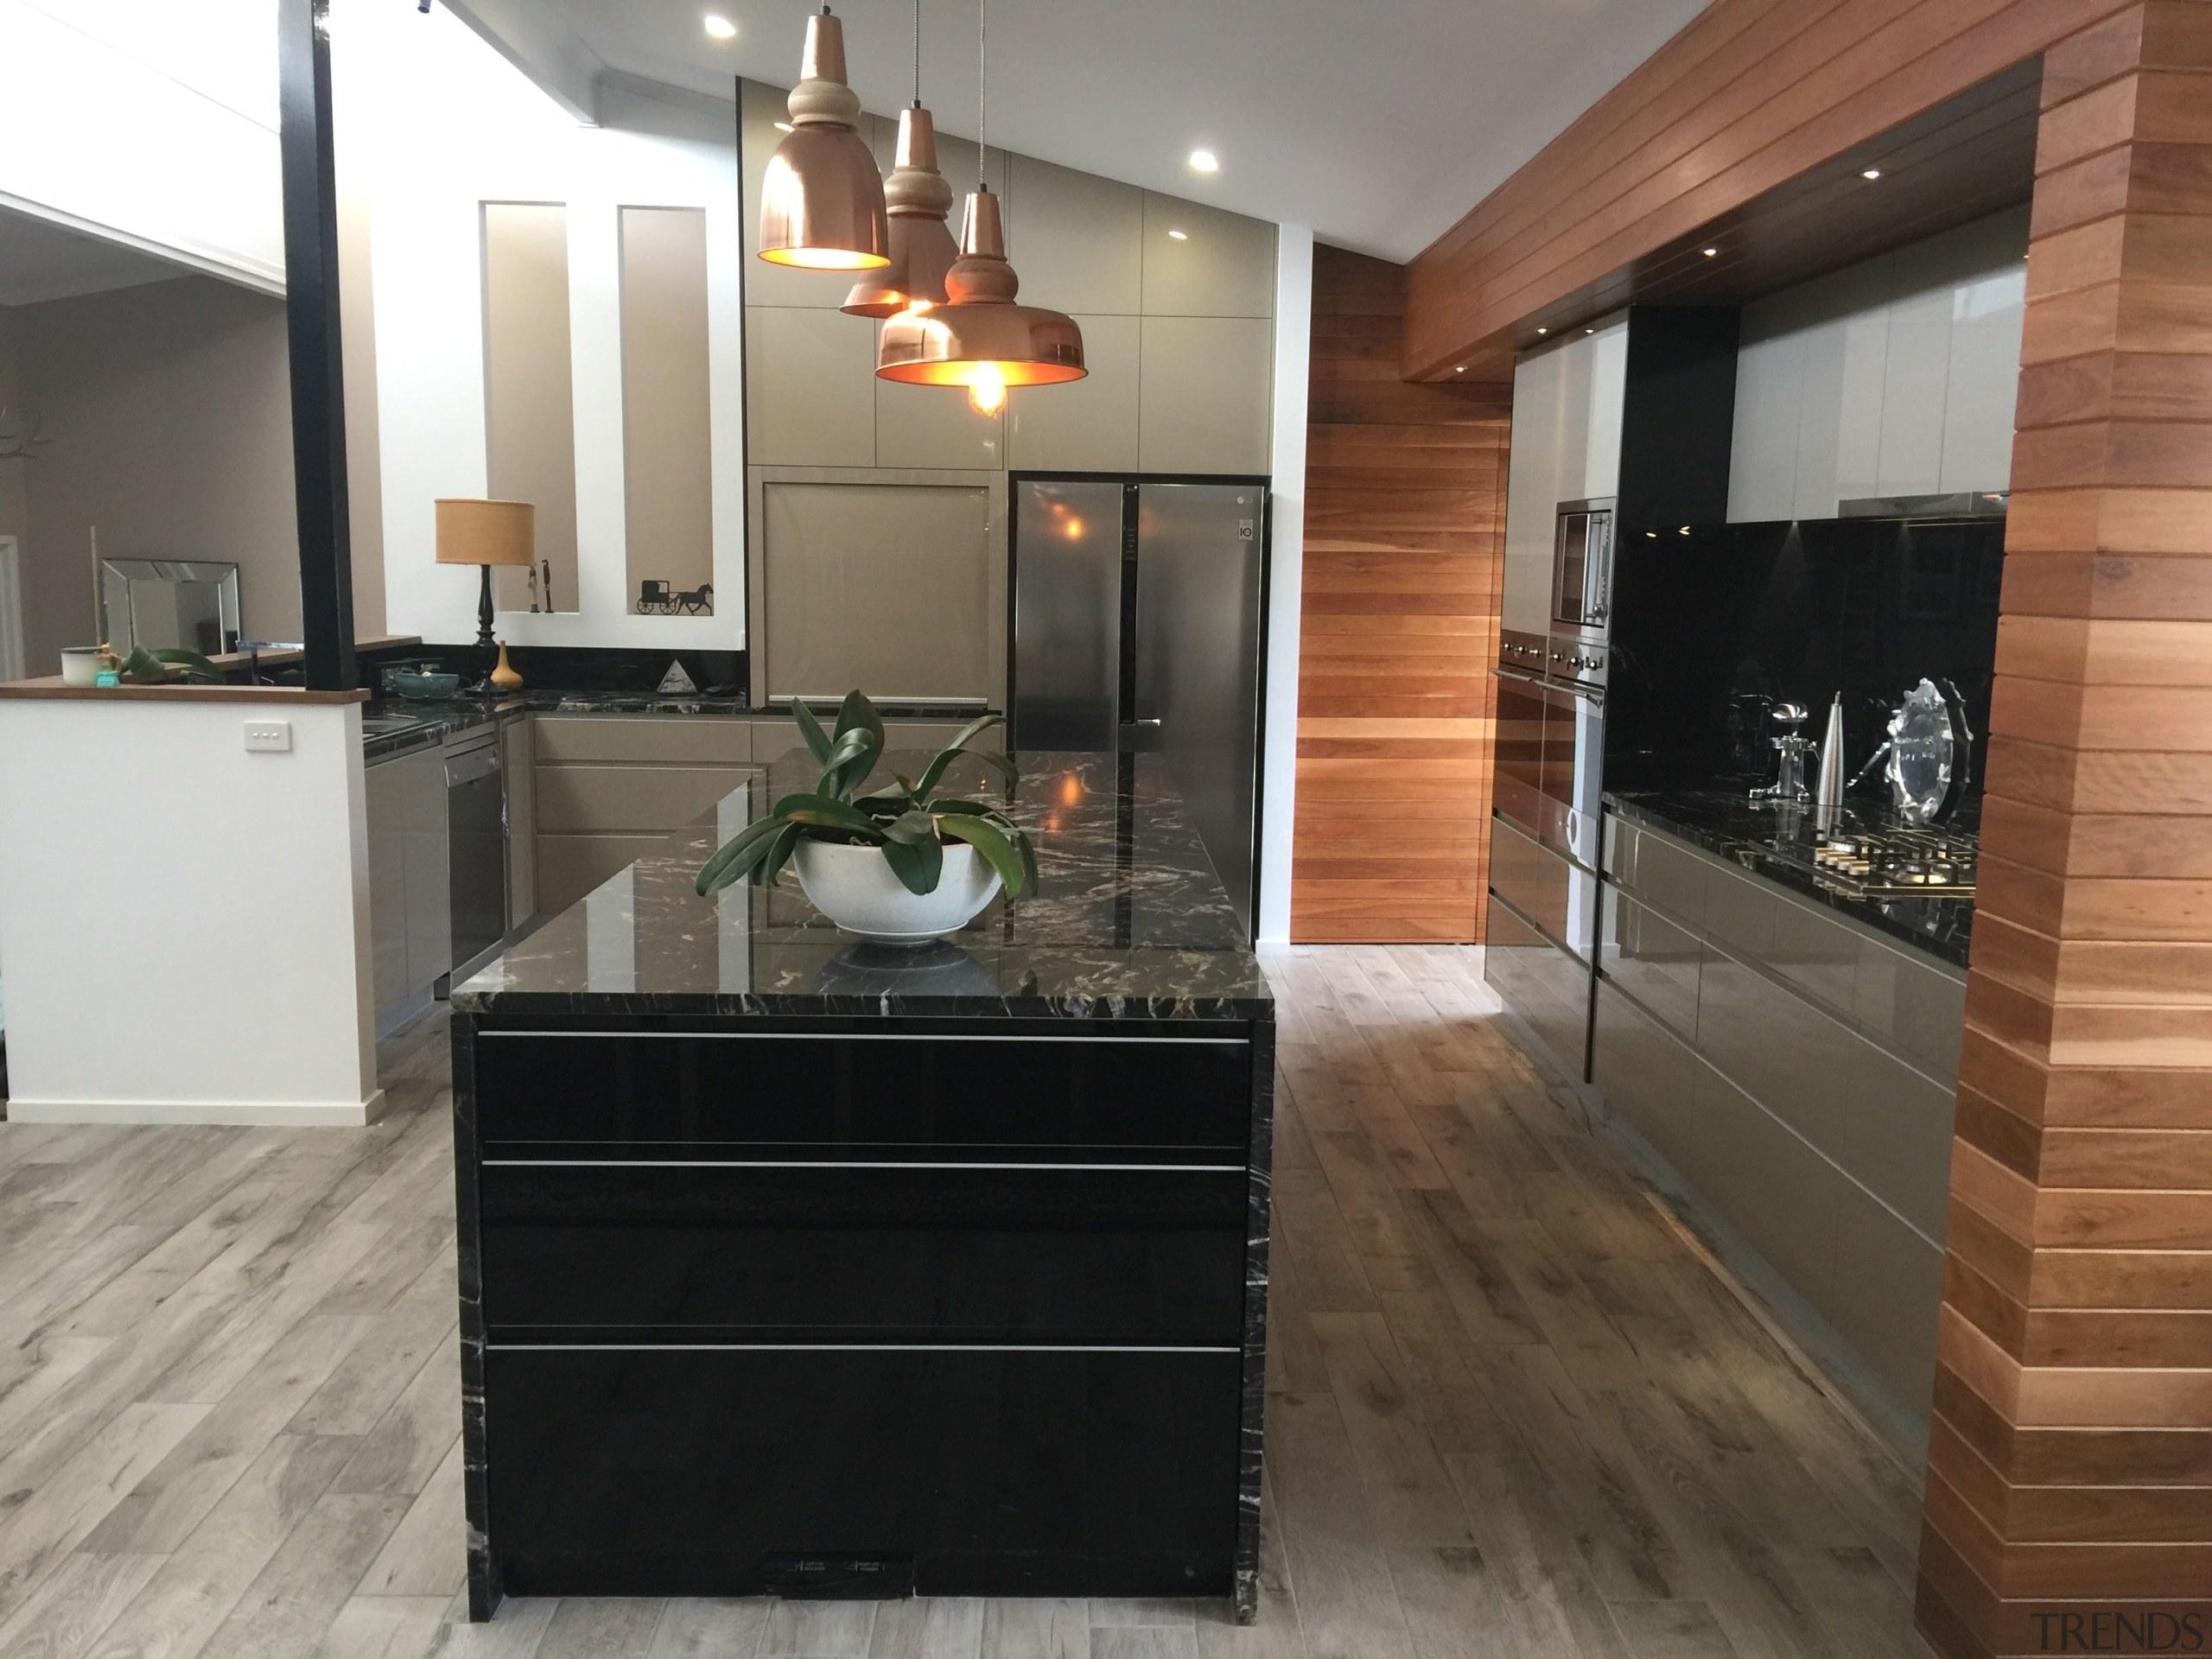 Centre Stage - Centre Stage - cabinetry | cabinetry, countertop, floor, flooring, hardwood, interior design, kitchen, laminate flooring, room, wood flooring, black